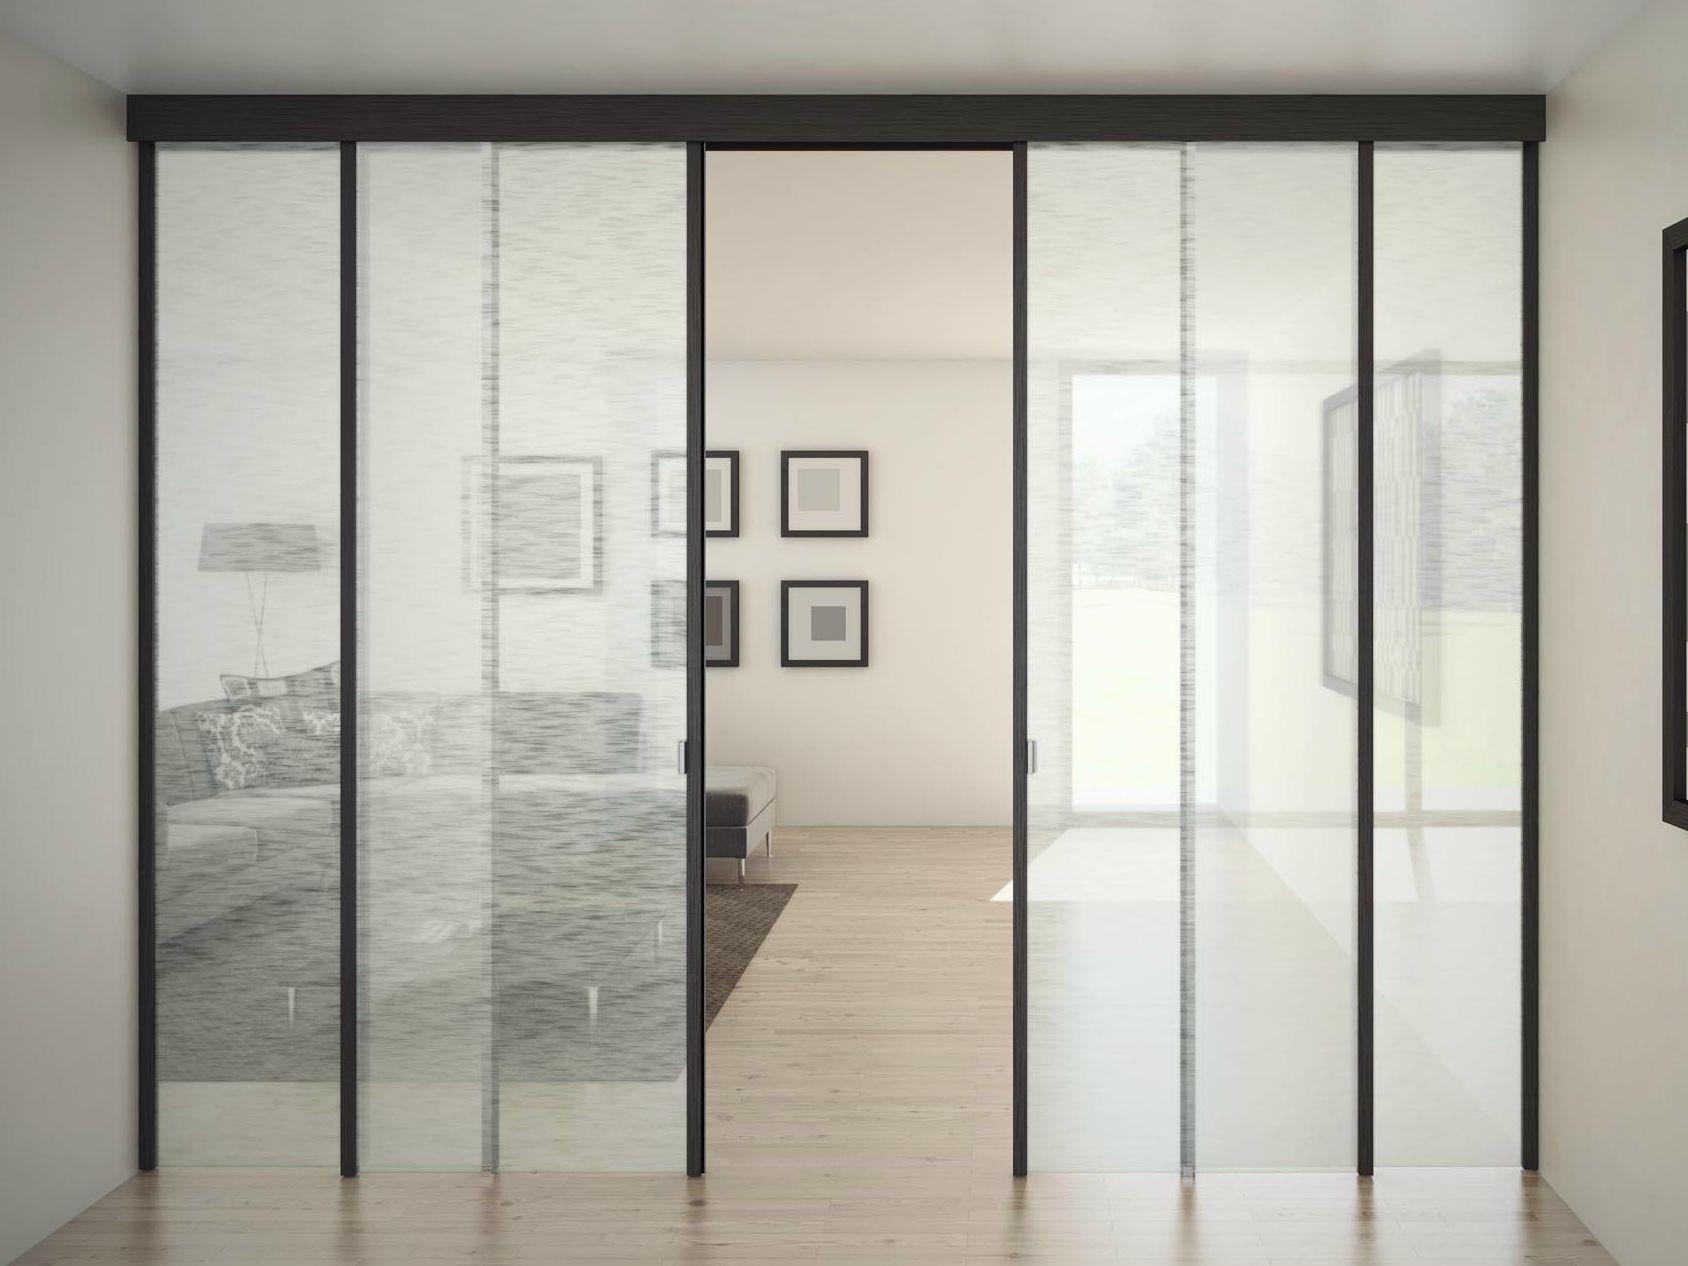 puerta corrediza de vidrio sinthesy quadra by foa